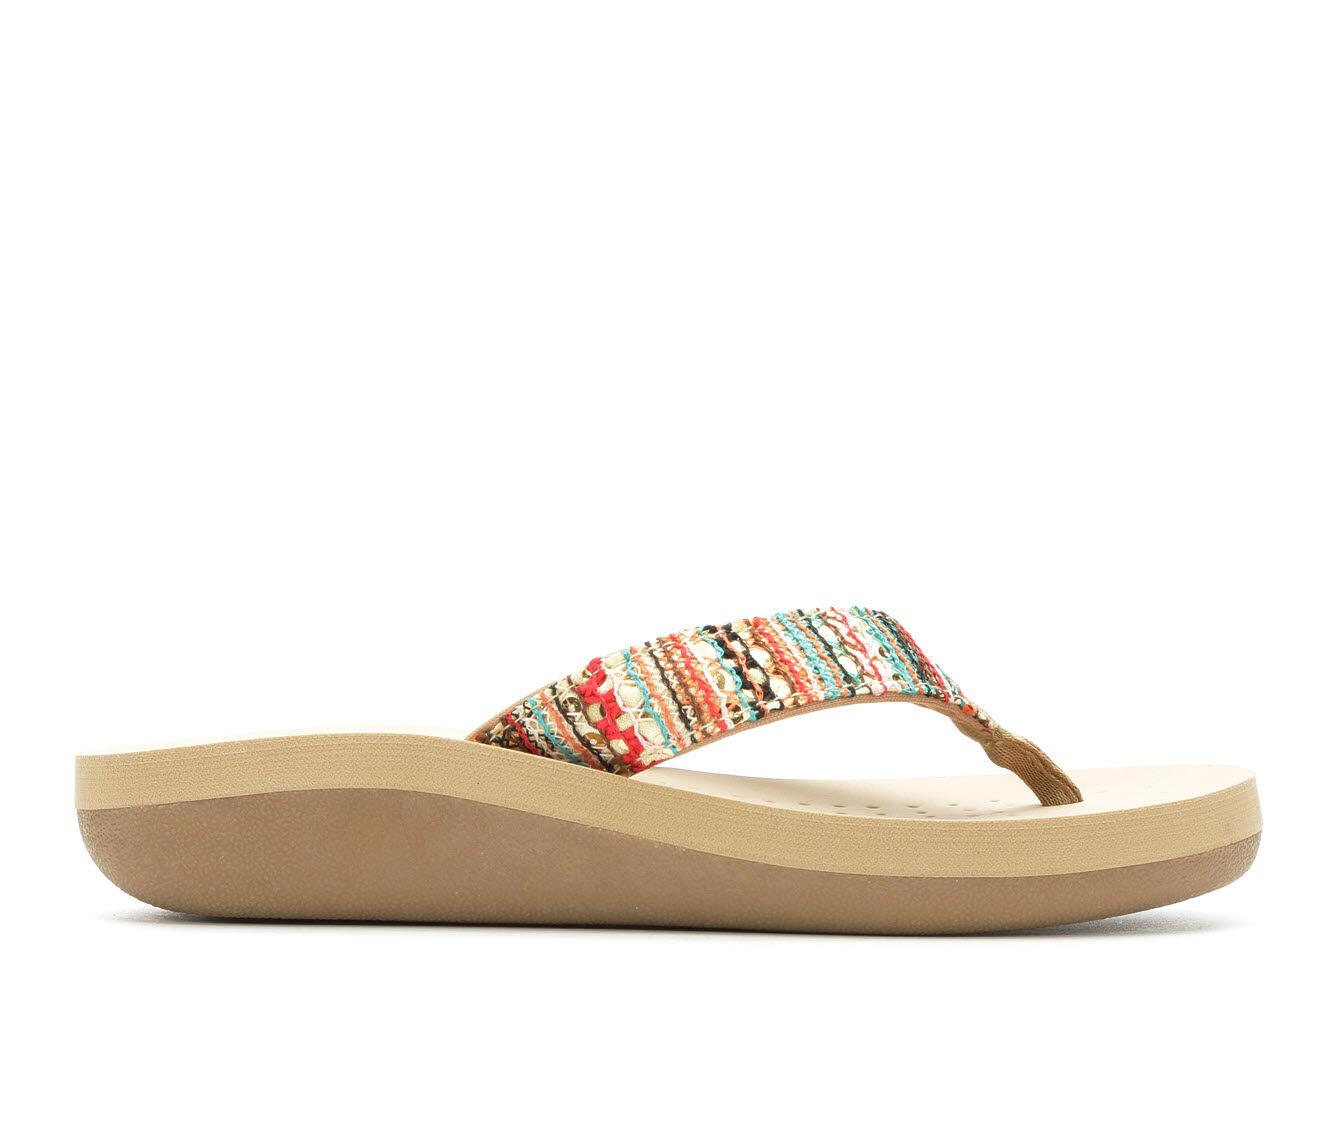 Complete Price Women's Volatile Redfern Sandals Natural Multi